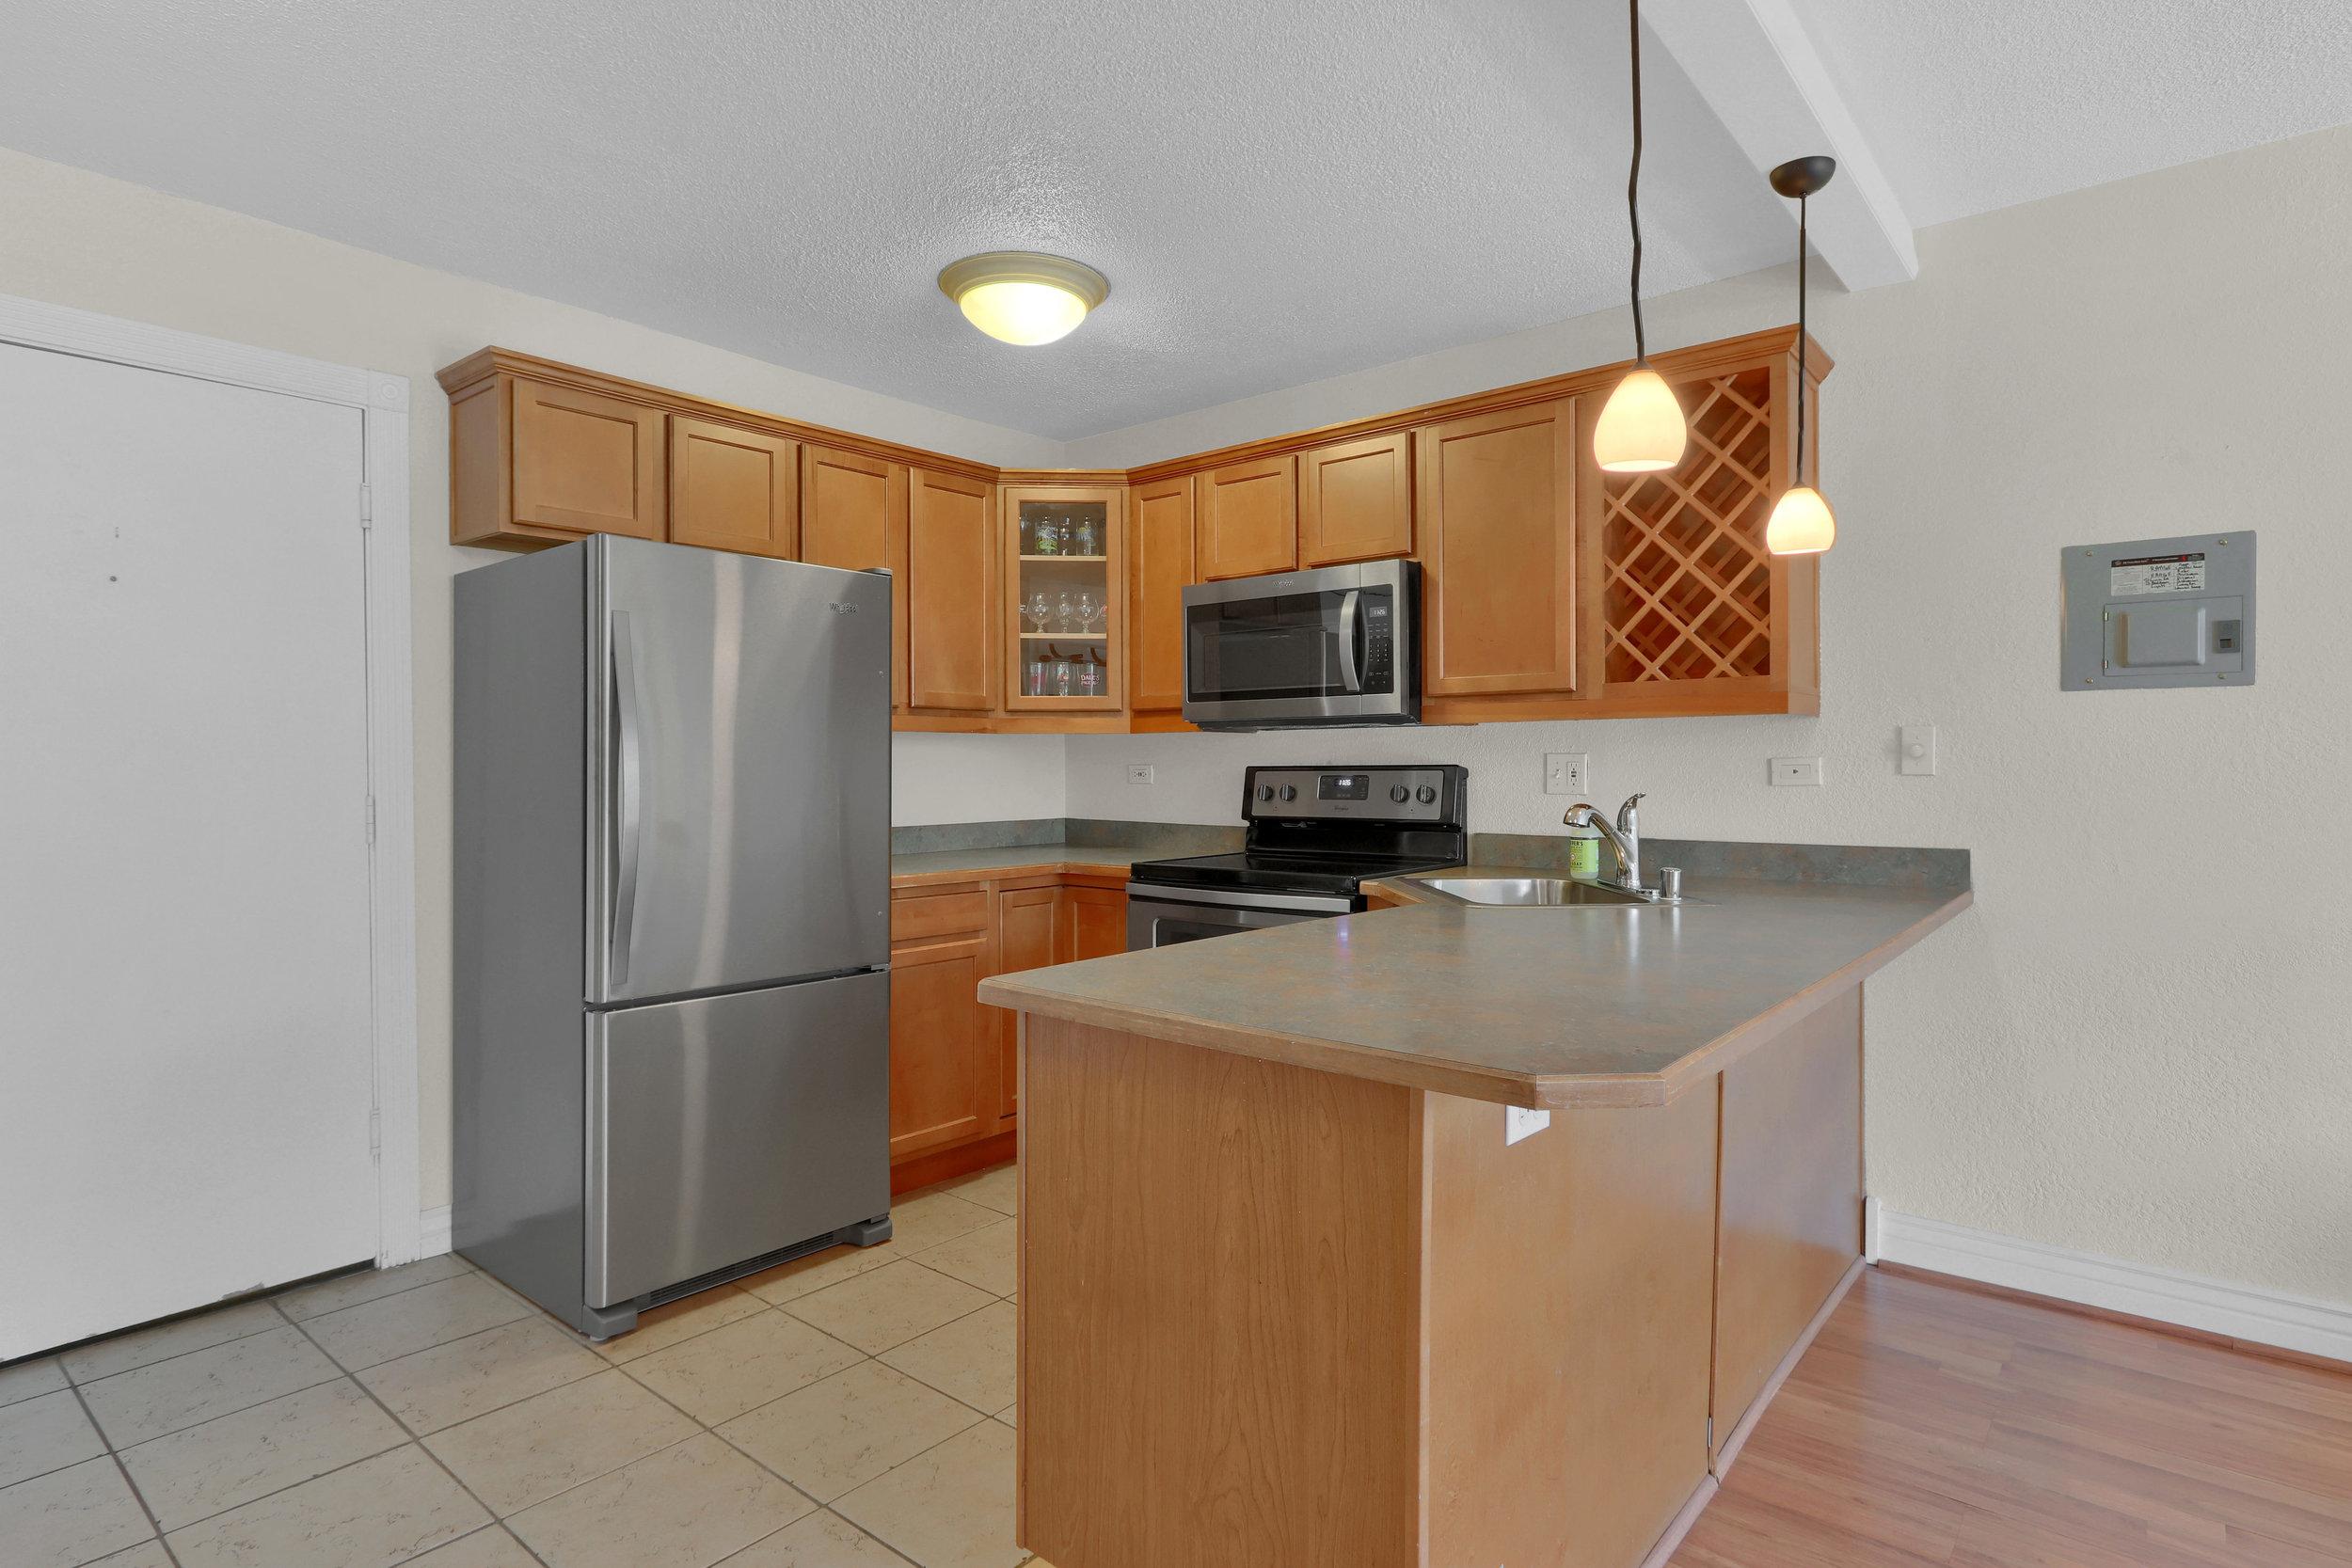 909 N Logan St Unit 3J Denver-print-005-001-Kitchen-4200x2800-300dpi.jpg